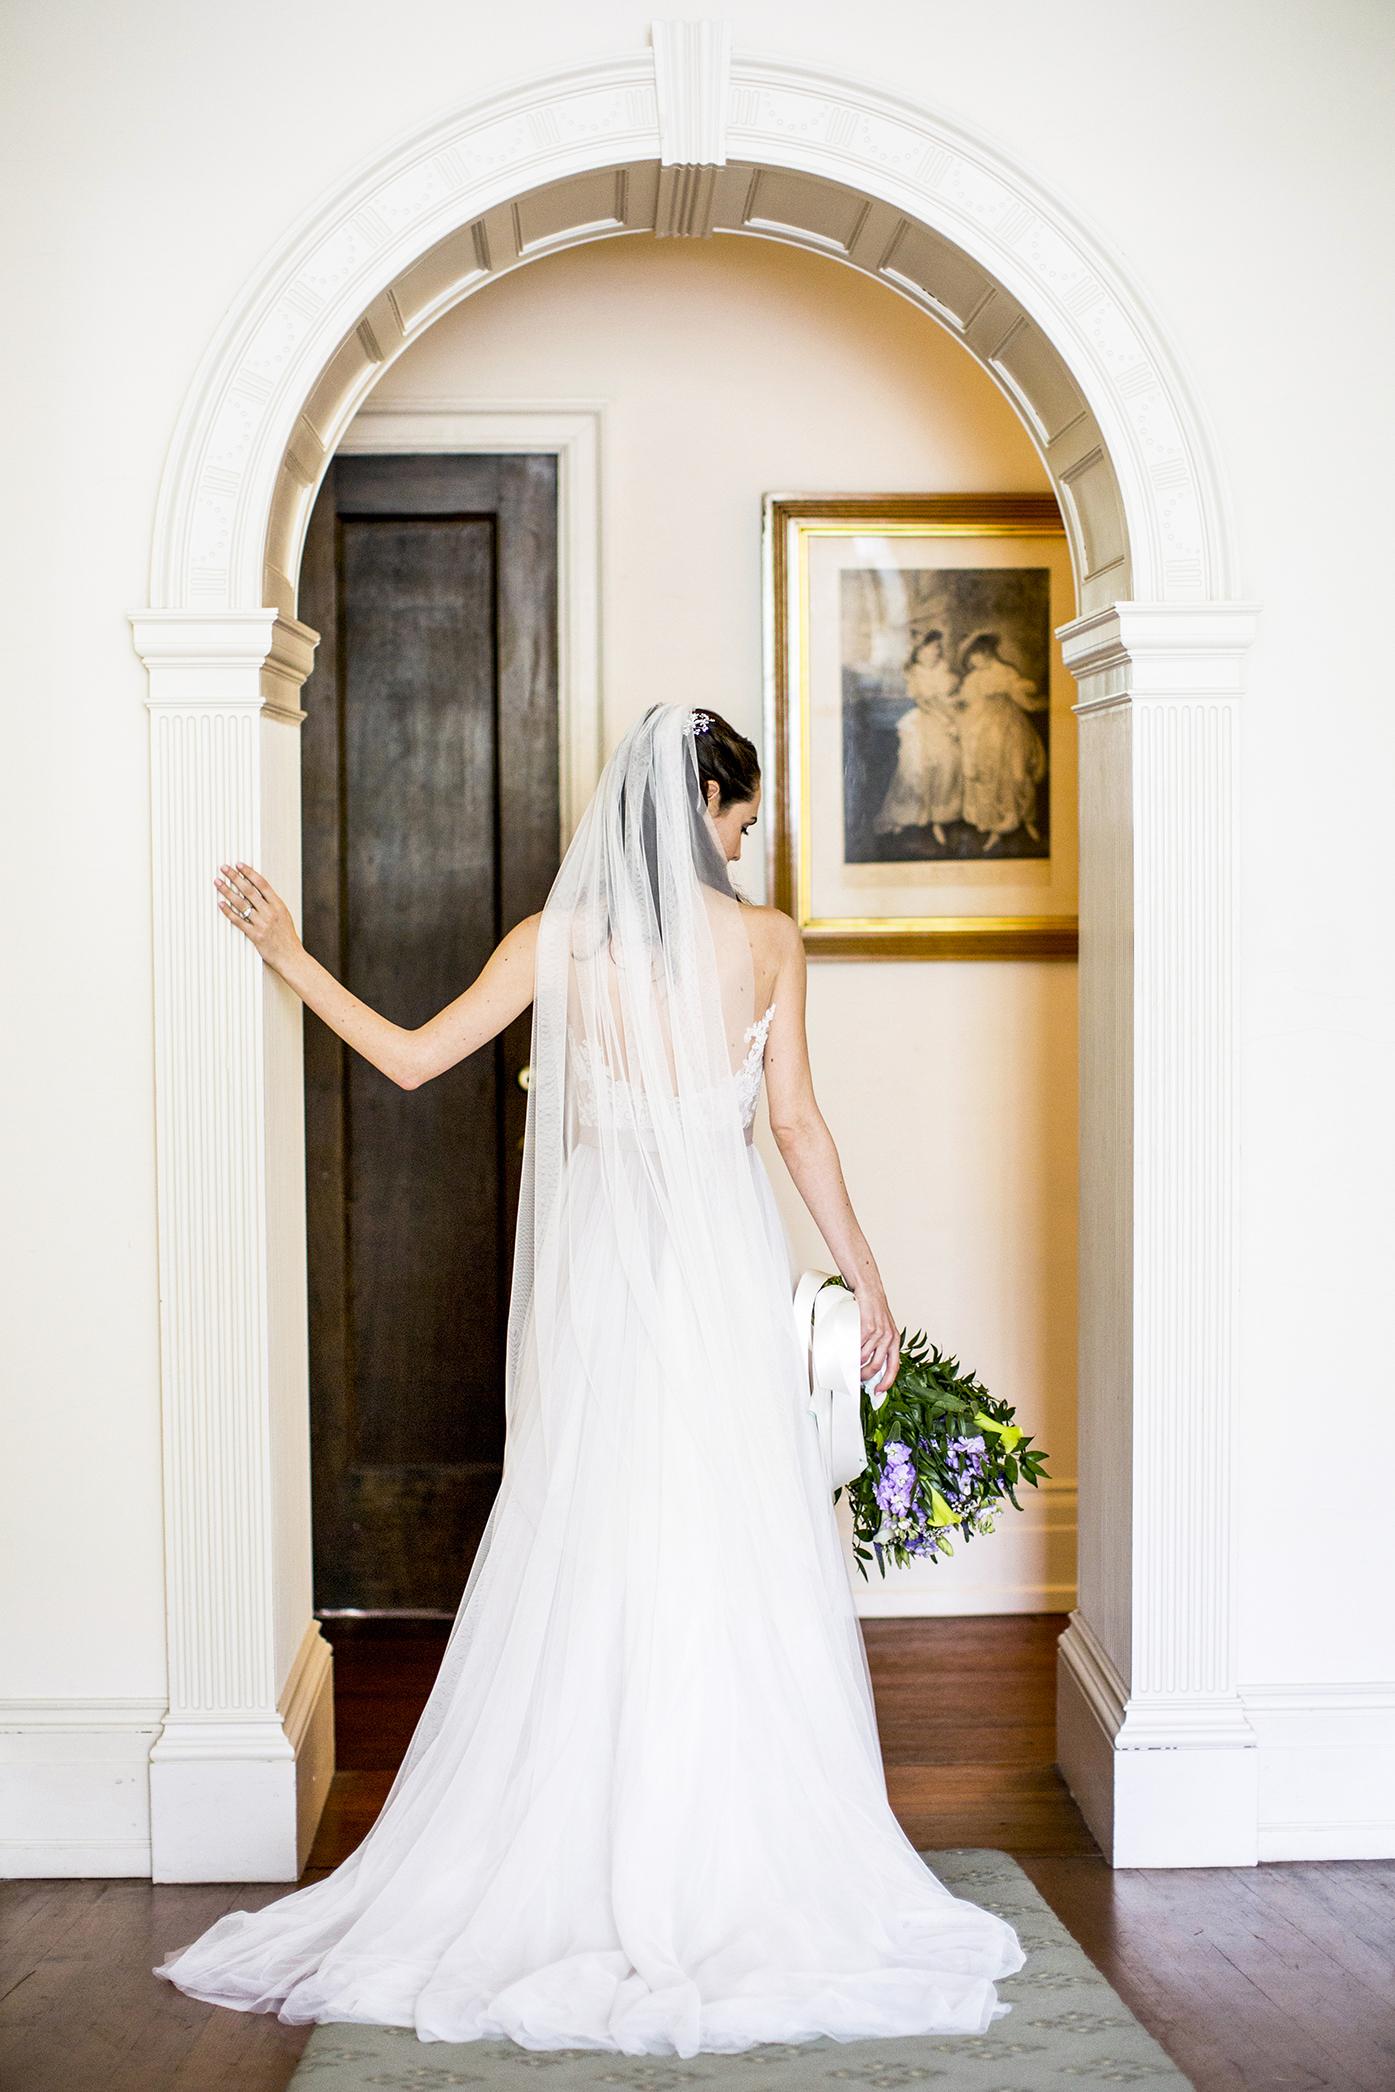 Bride in doorway wearing long veil - photo by Anna Schmidt Photography